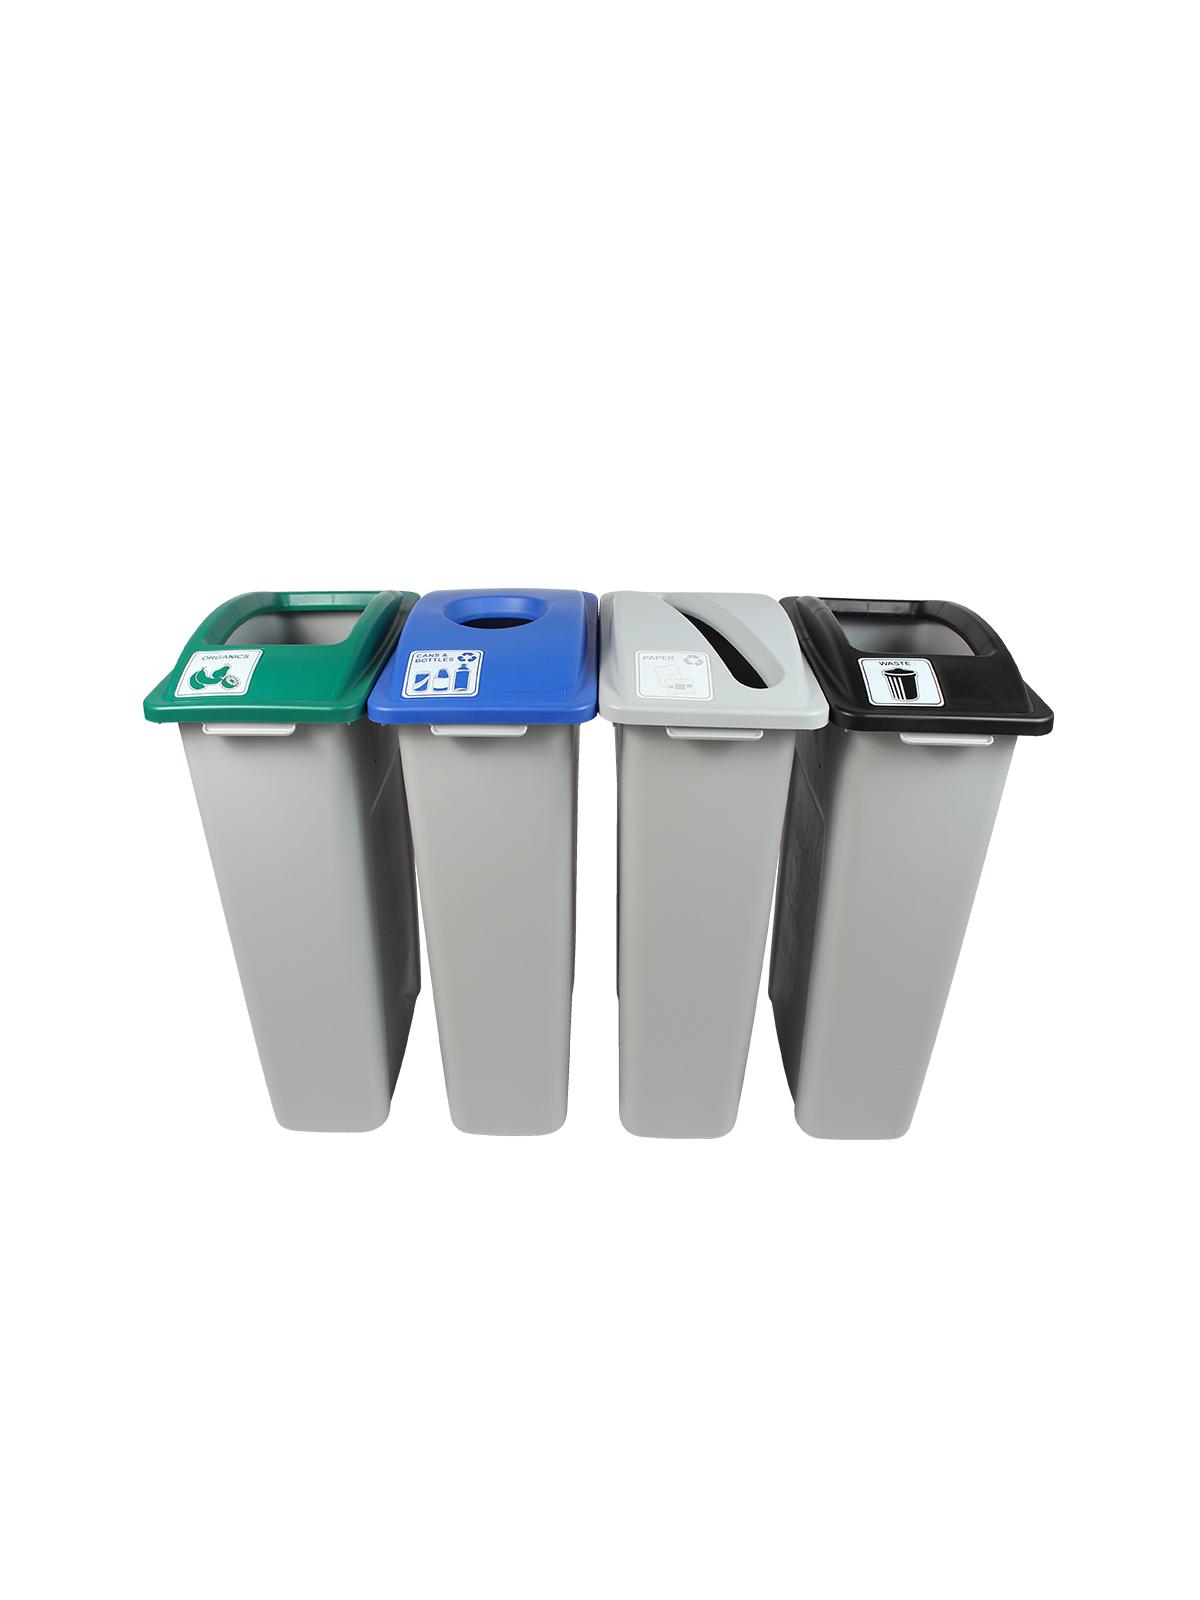 WASTE WATCHER - Quad - Cans & Bottles-Paper-Compost-Waste - Circle-Slot-Full - Grey-Blue-Grey-Green-Black